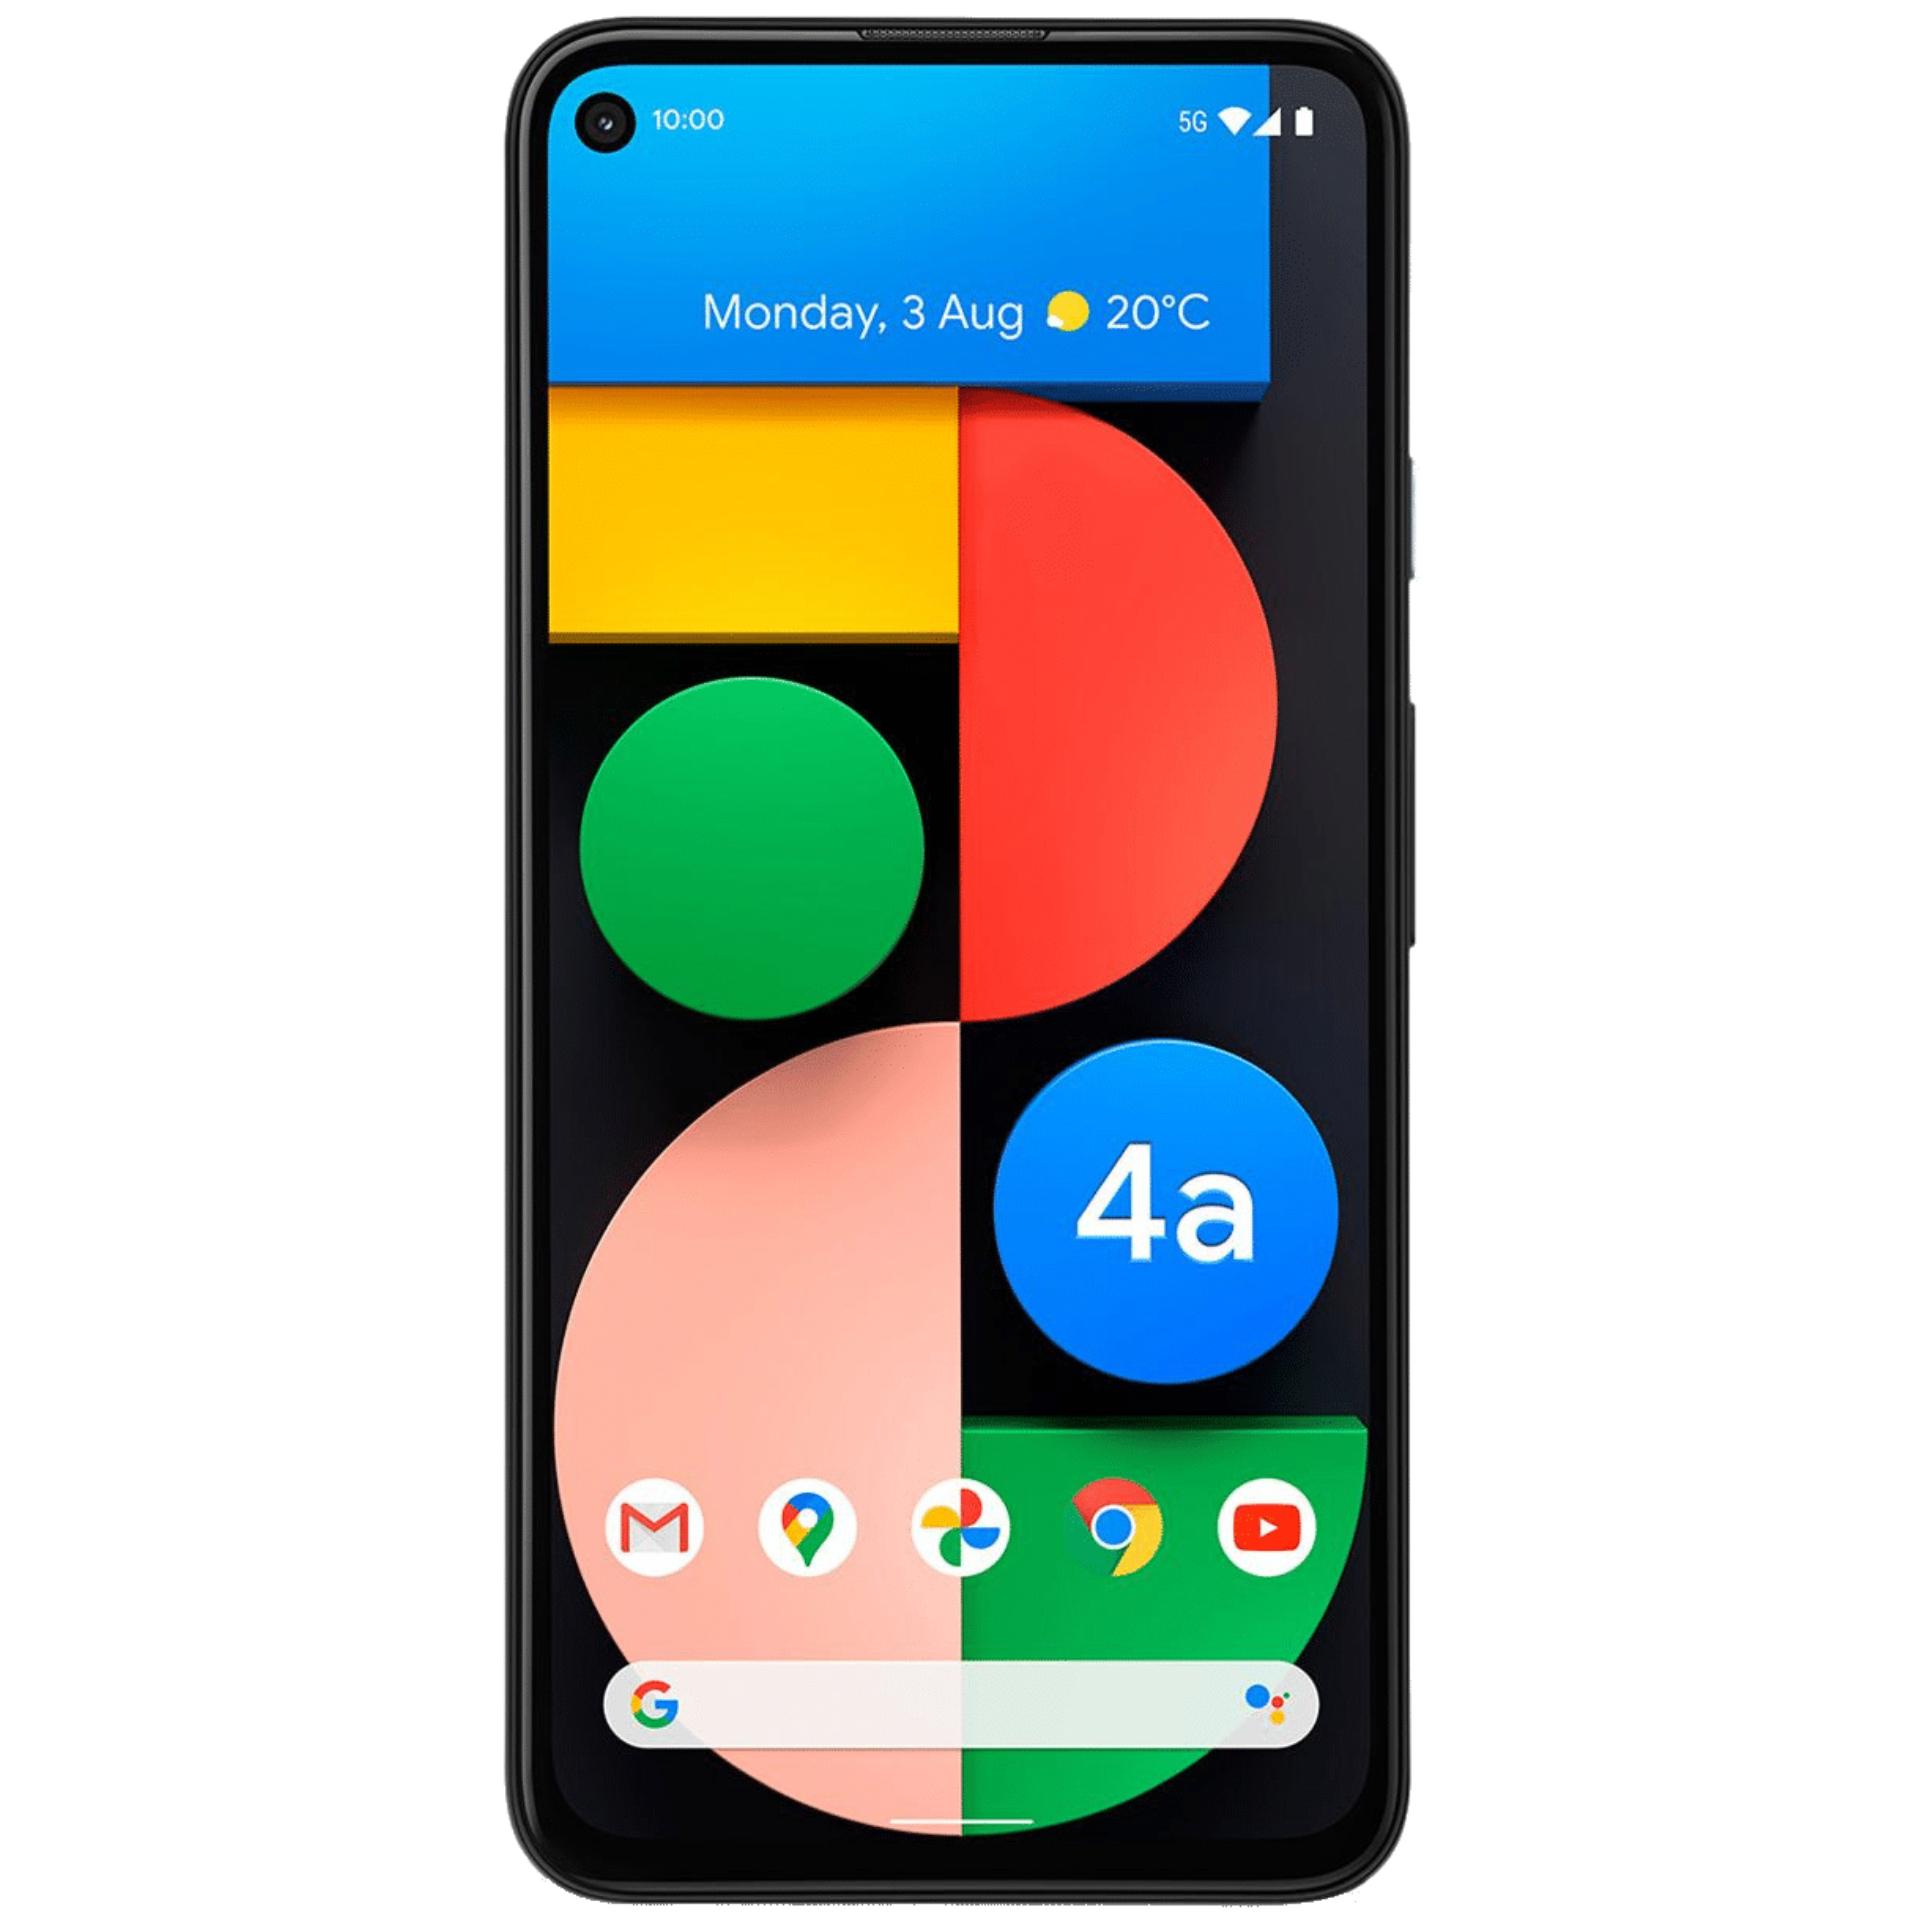 "Ausgewählte Local Guides: Google Pixel4a 128/6GB (Snapdragon 730G, 5.81"" OLED Display, 3140mah Akku, NFC: Google Pay, Klinke, 143 Gramm)"